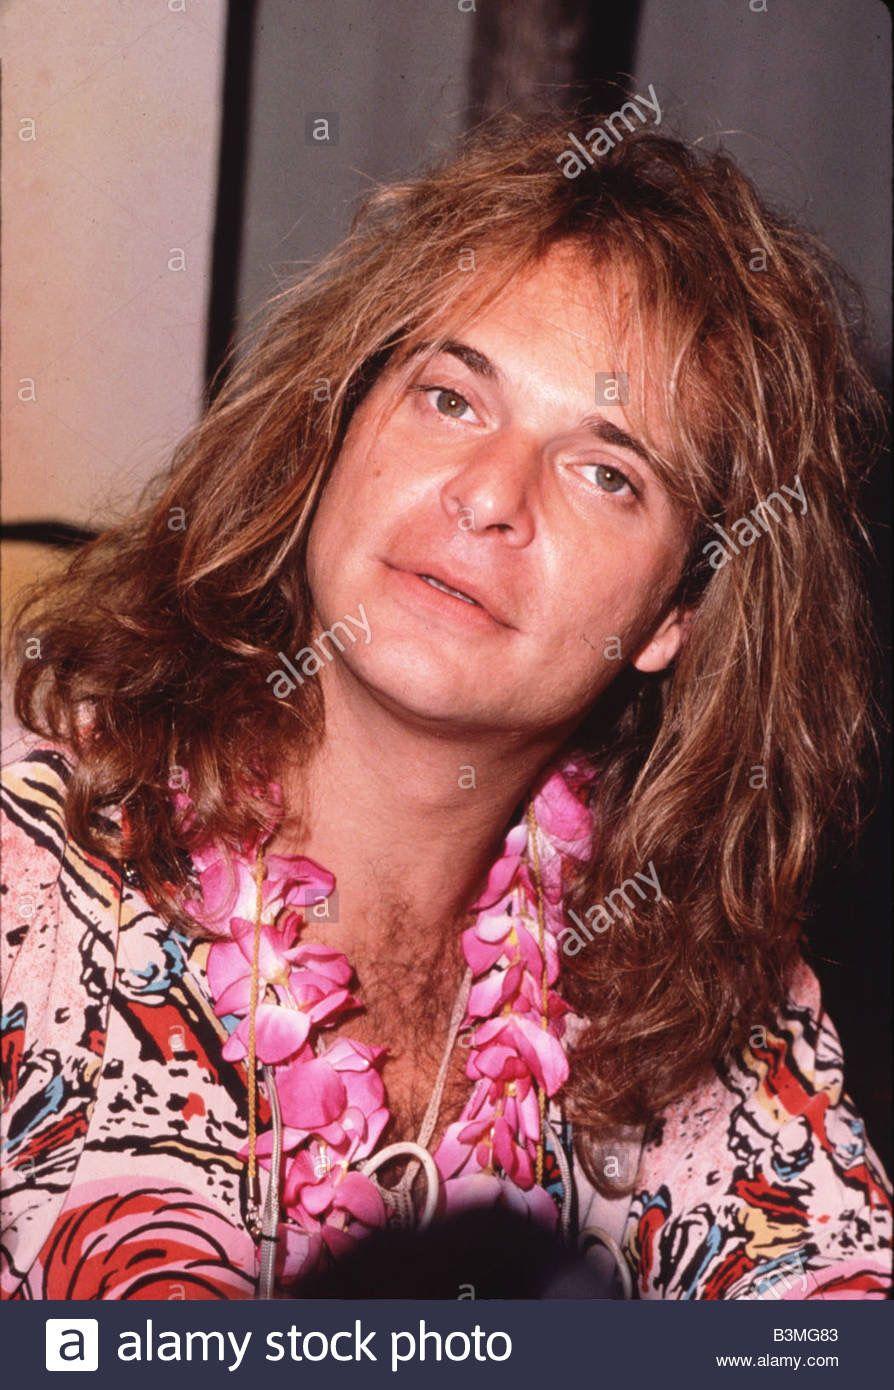 Smile Head Tilt Empathy Connecting You Got It David Rf David Lee Roth Aging Gracefully Van Halen